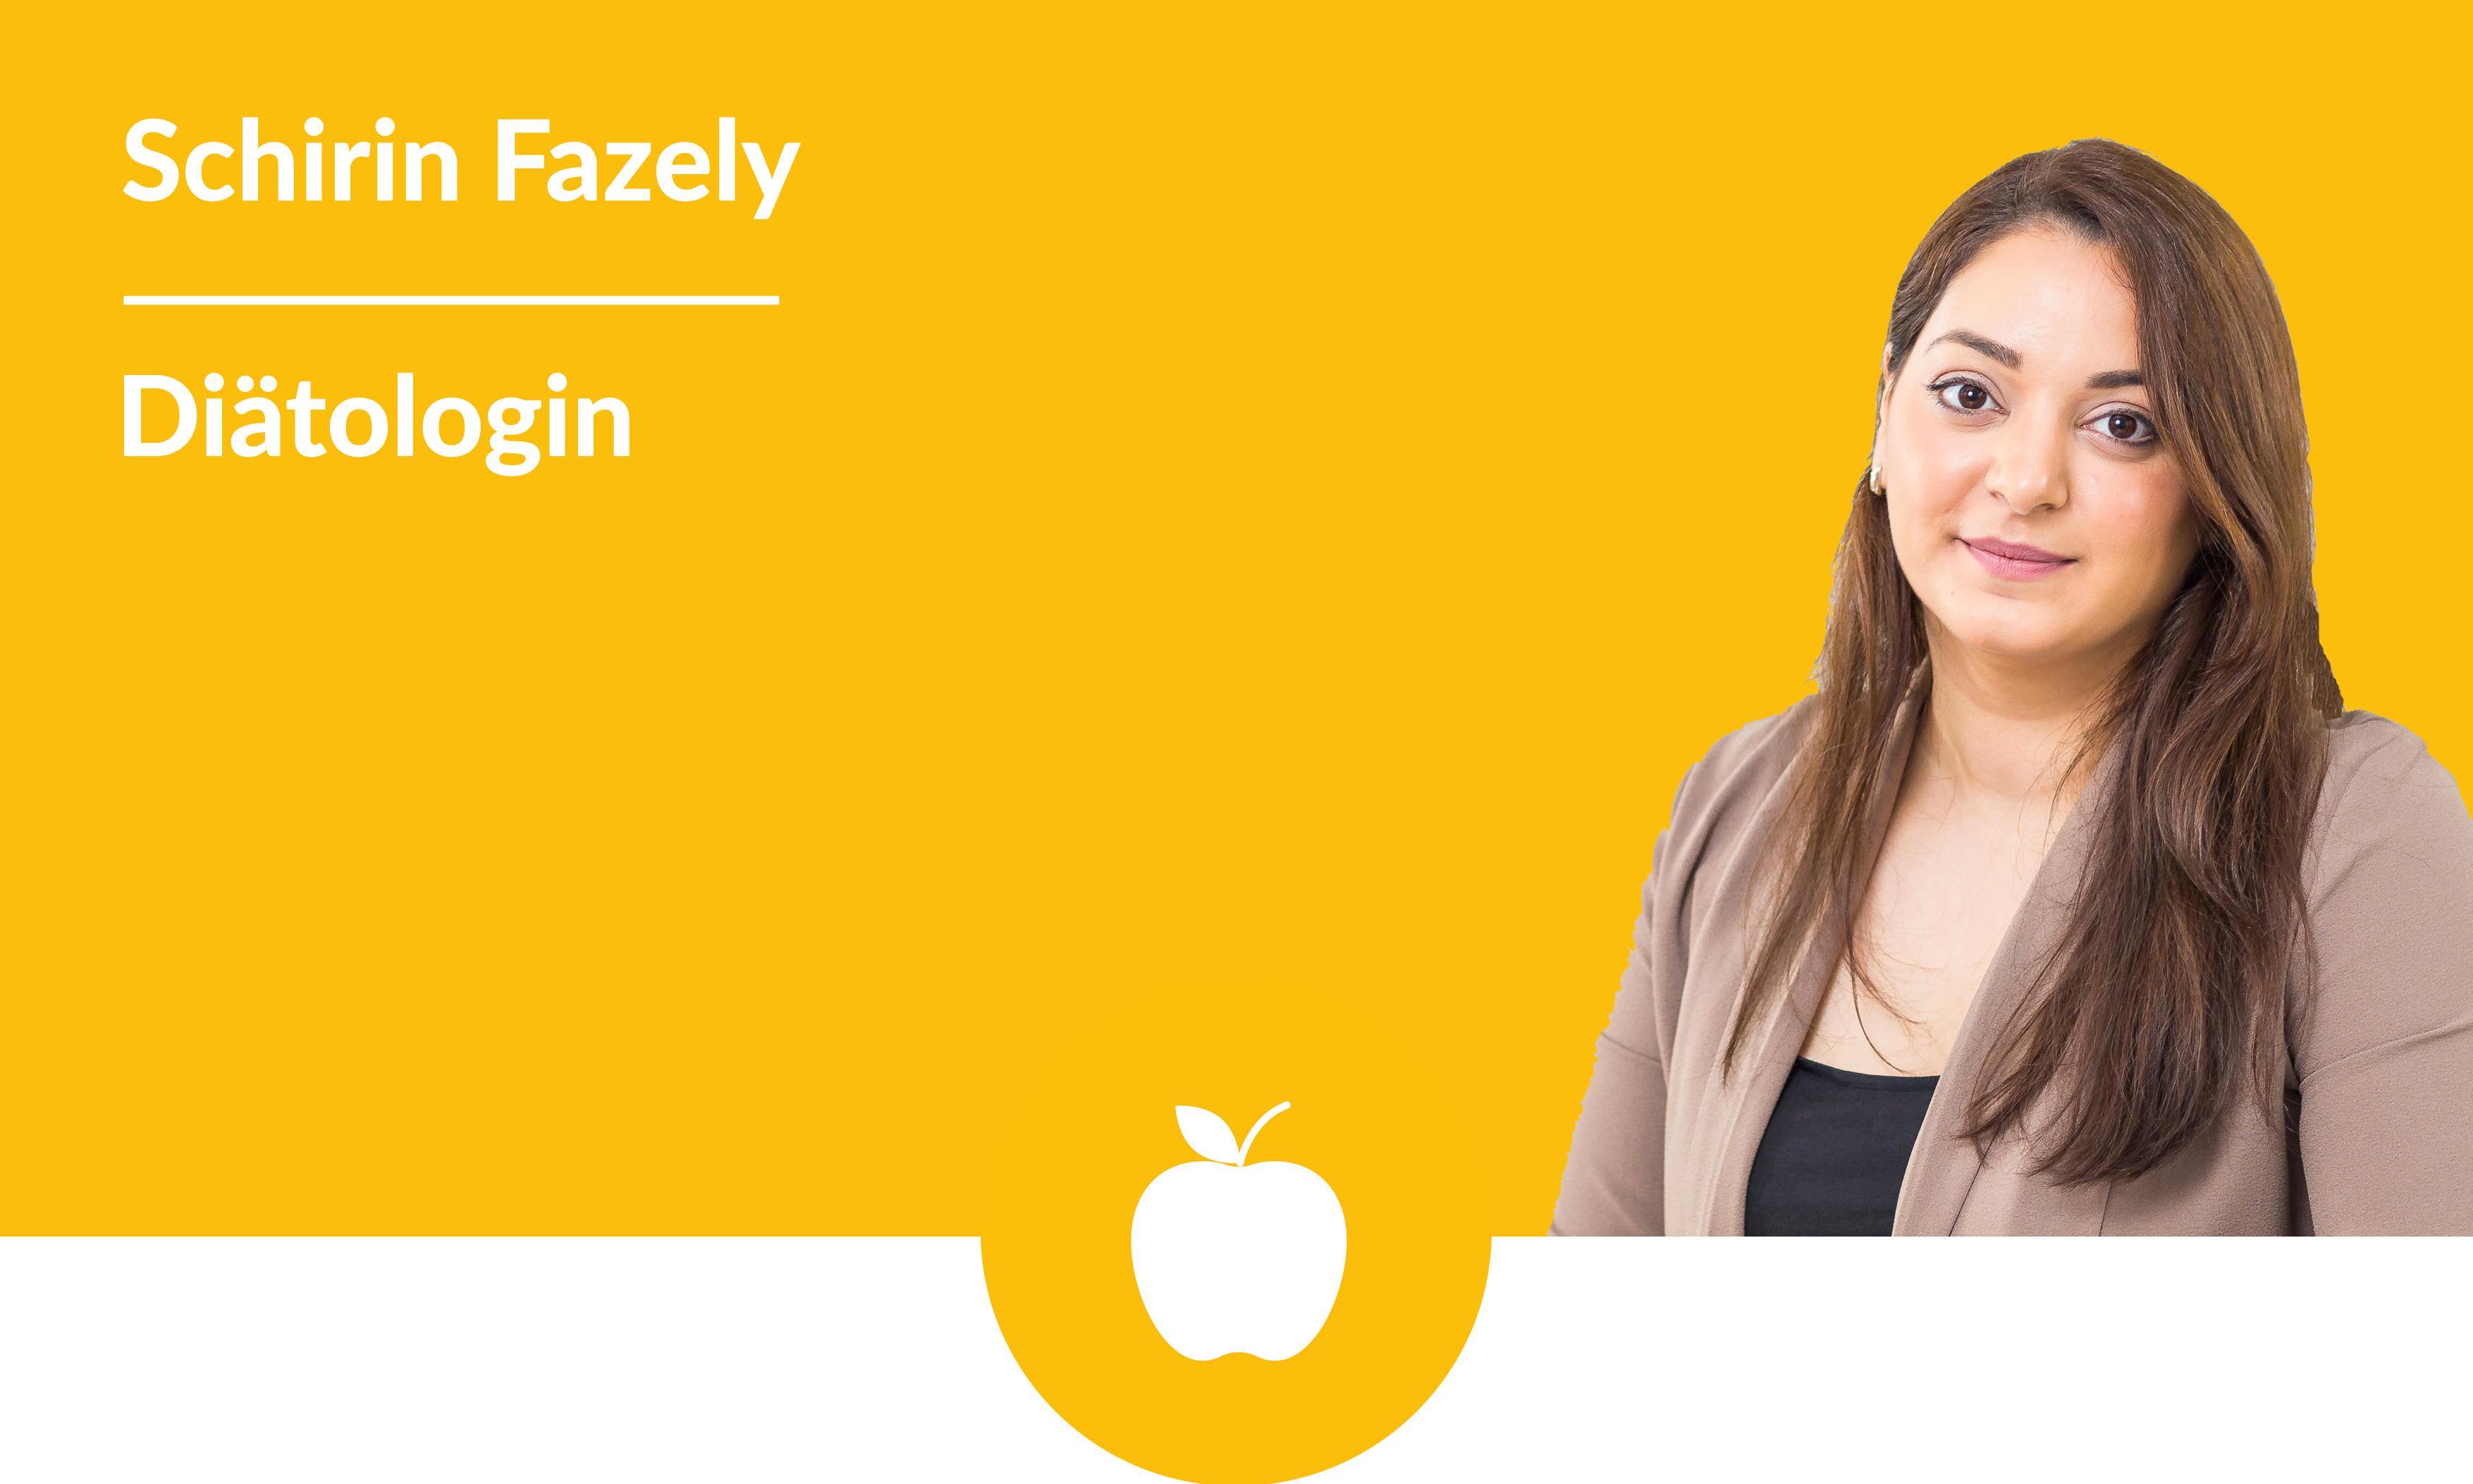 Schirin Fazely, Diätologin